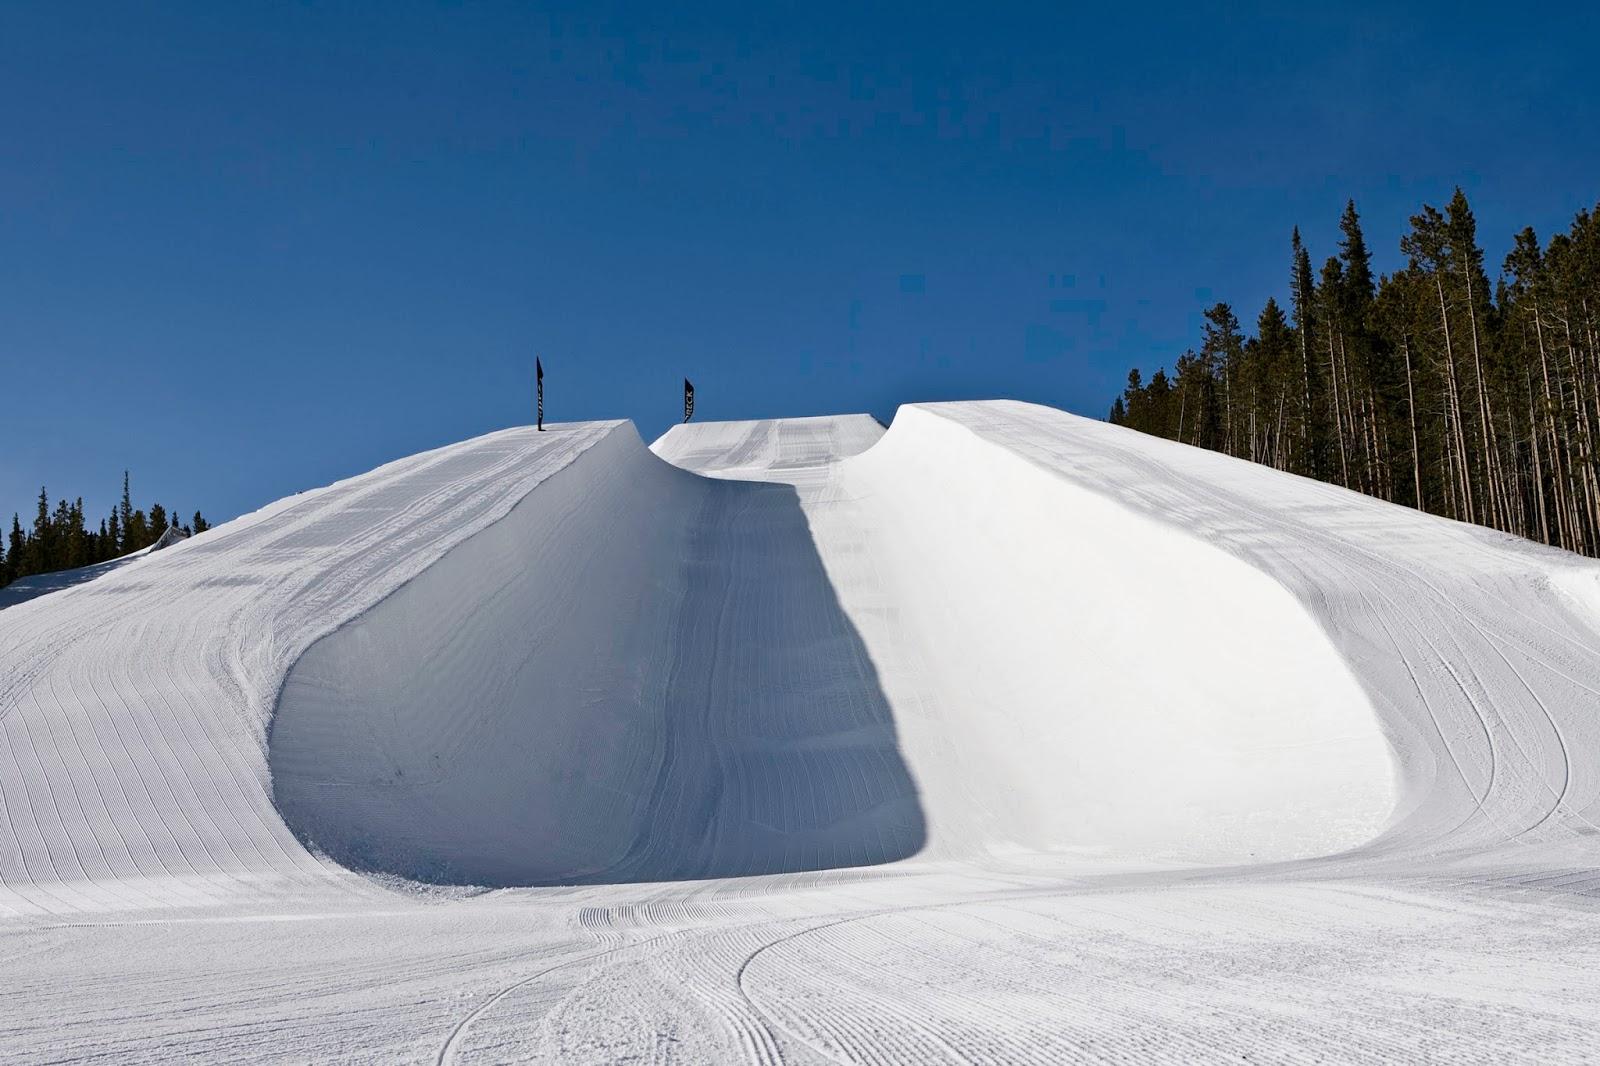 Breckenridge Colorado, USA - Top 10 Snow Parks in The World